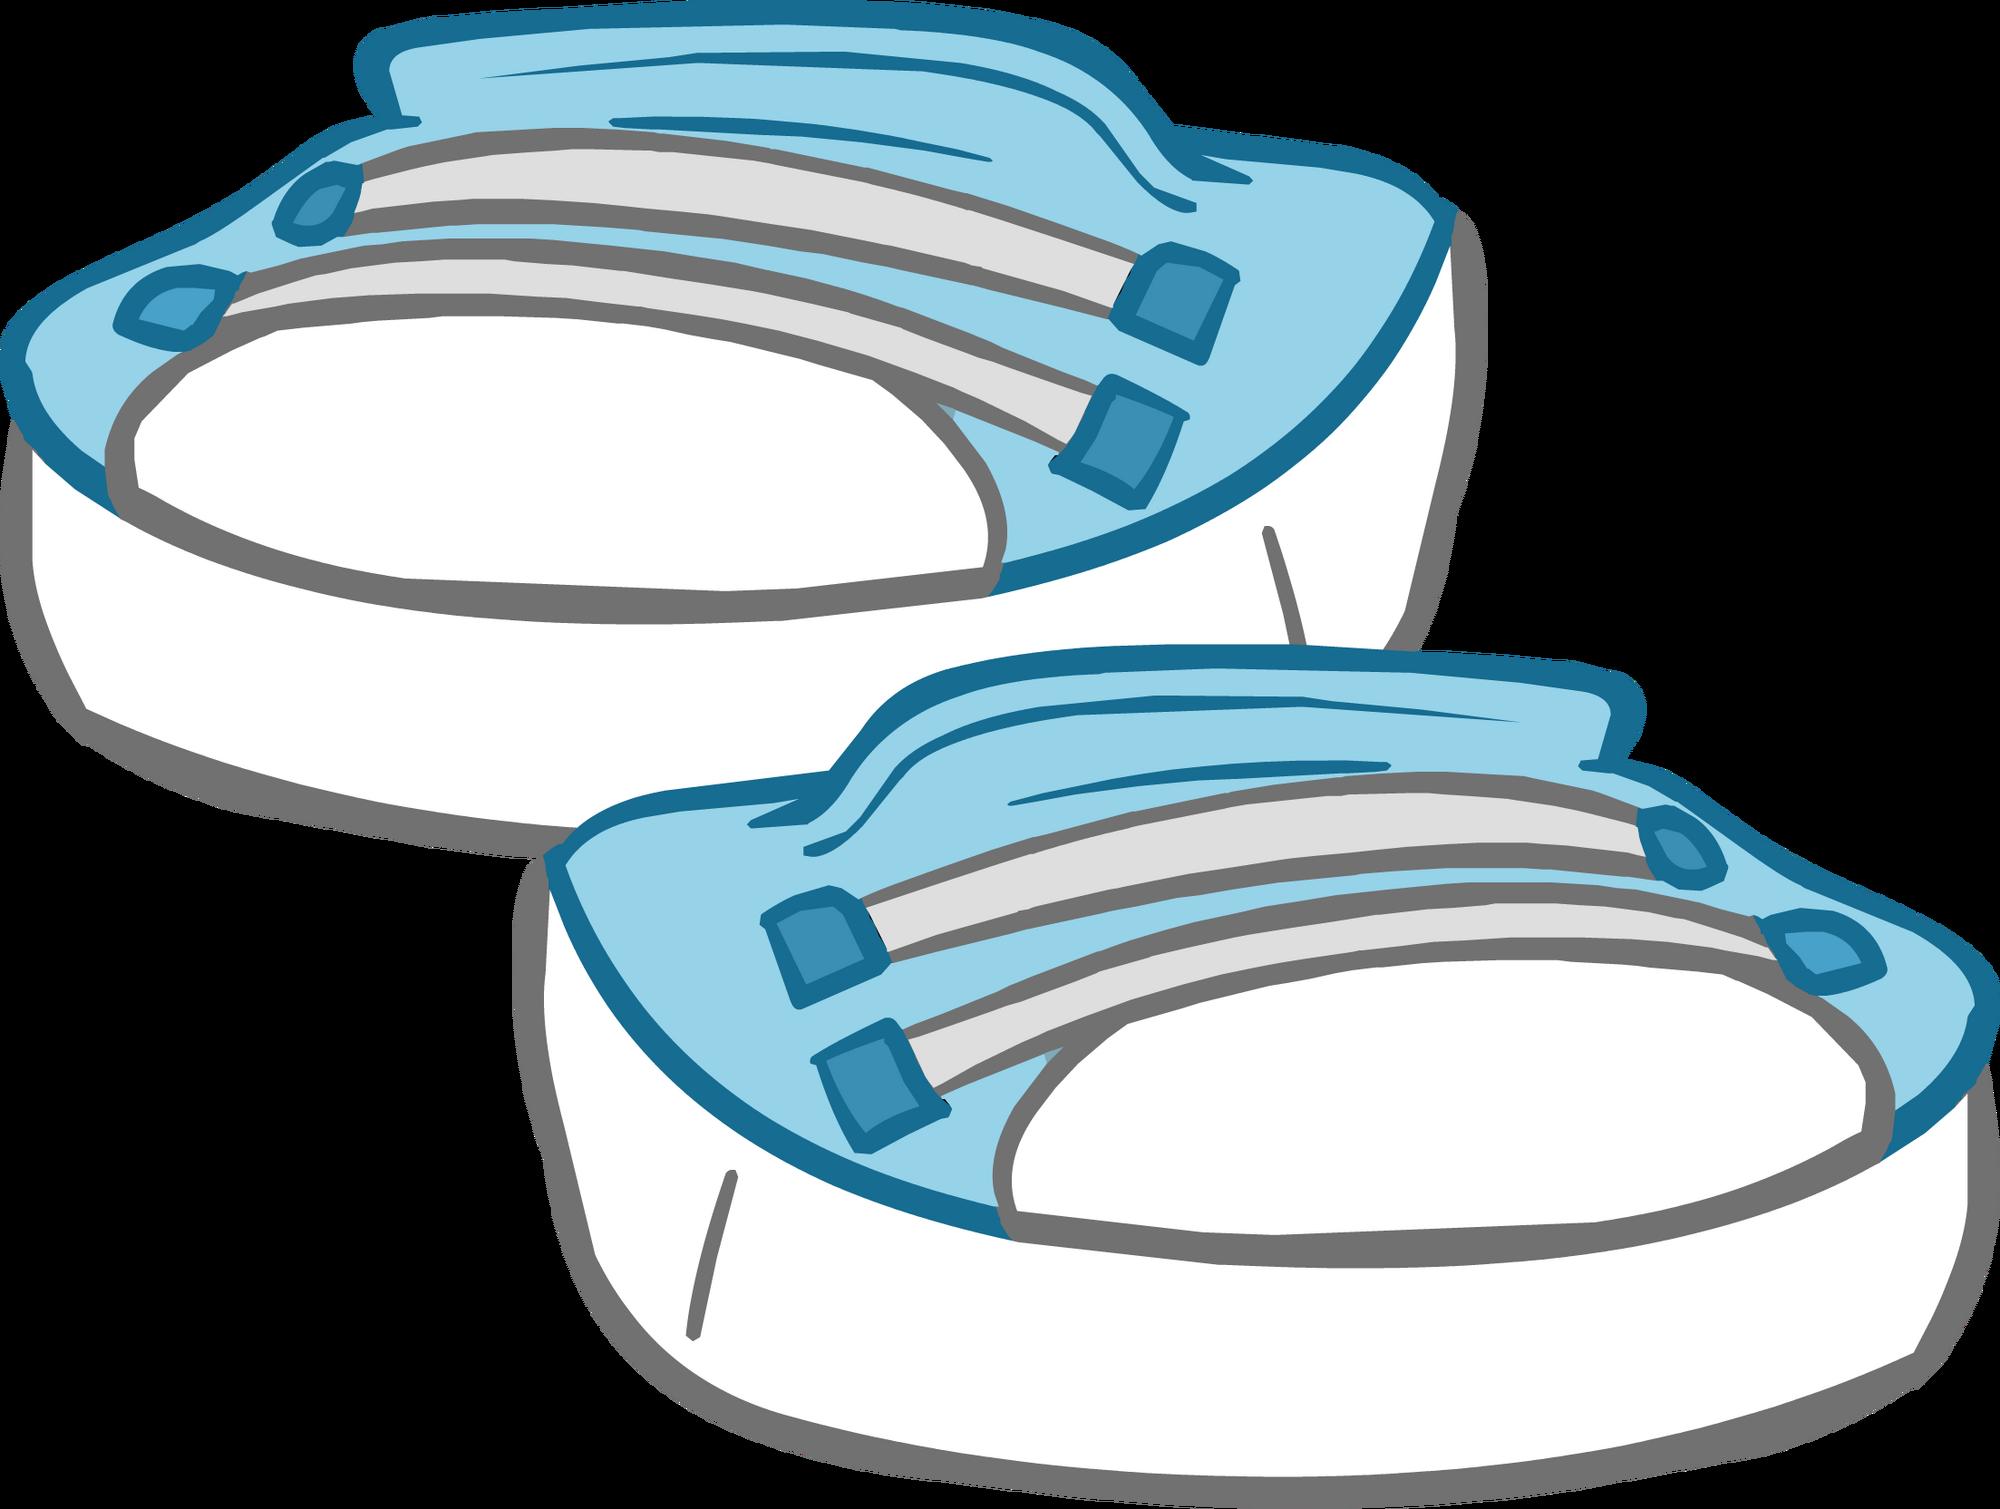 sky blue sneakers club penguin wiki fandom powered by wikia